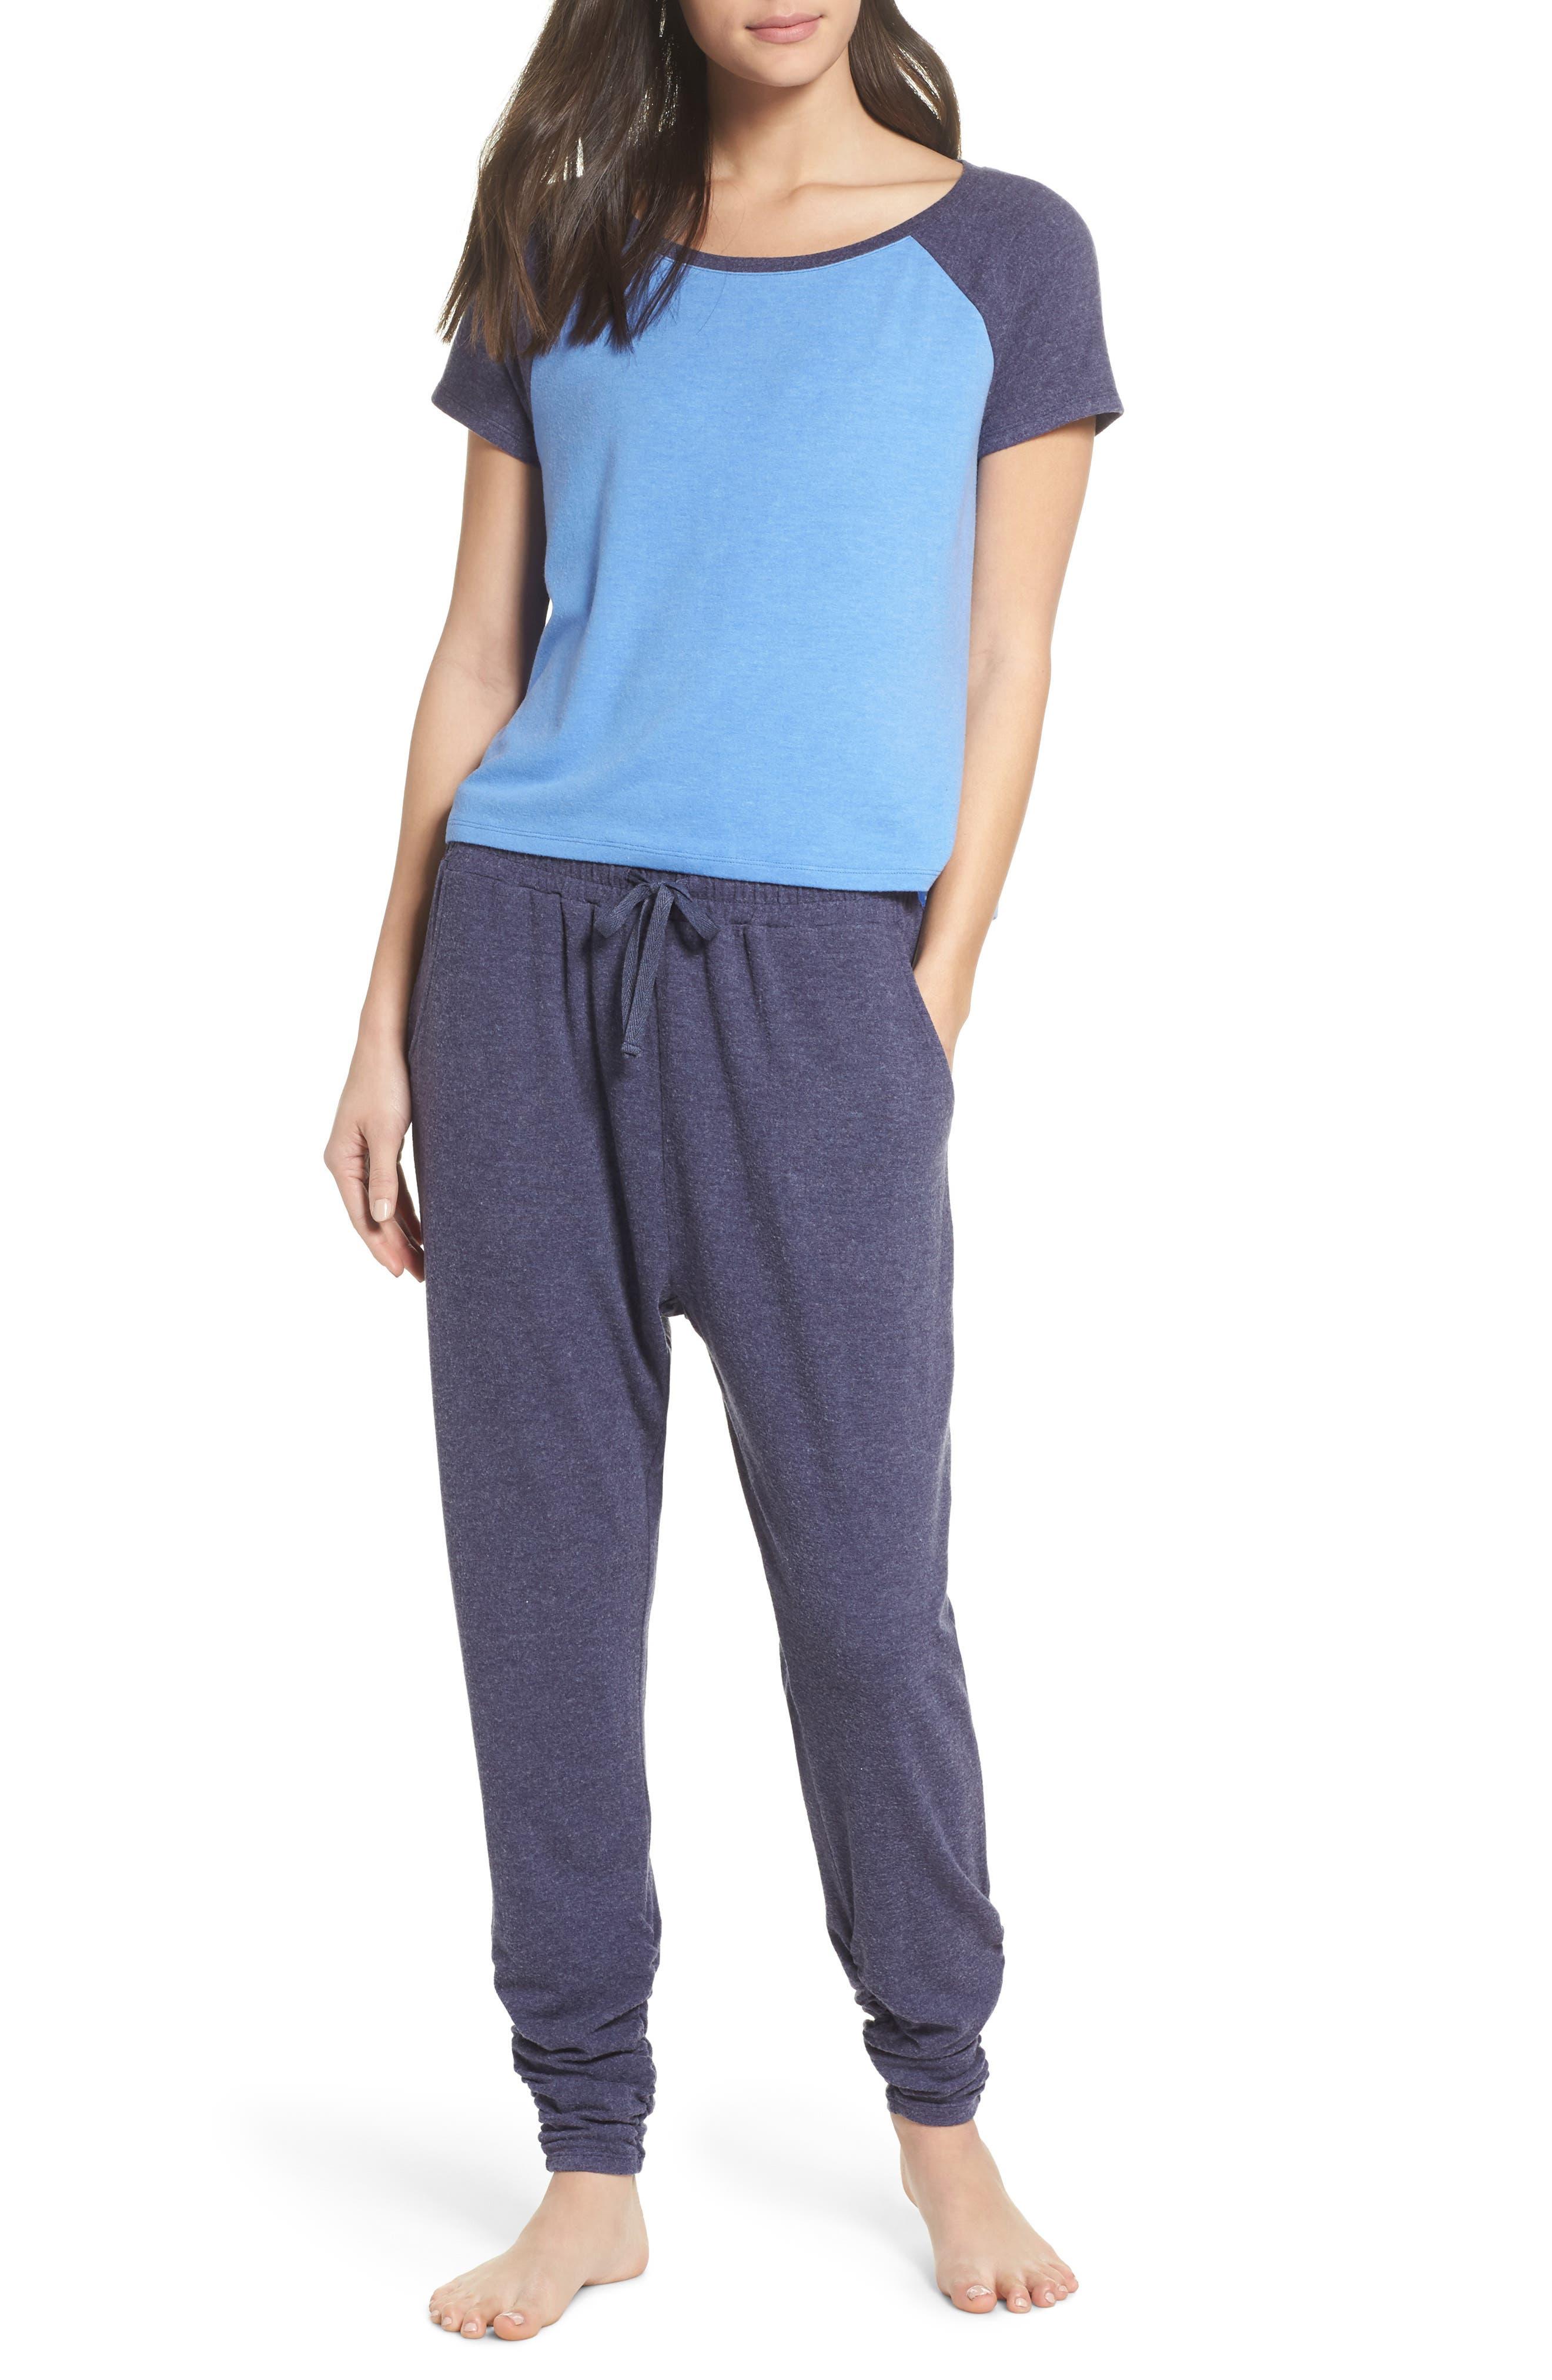 Main Image - Make + Model Cloud 9 Pajamas